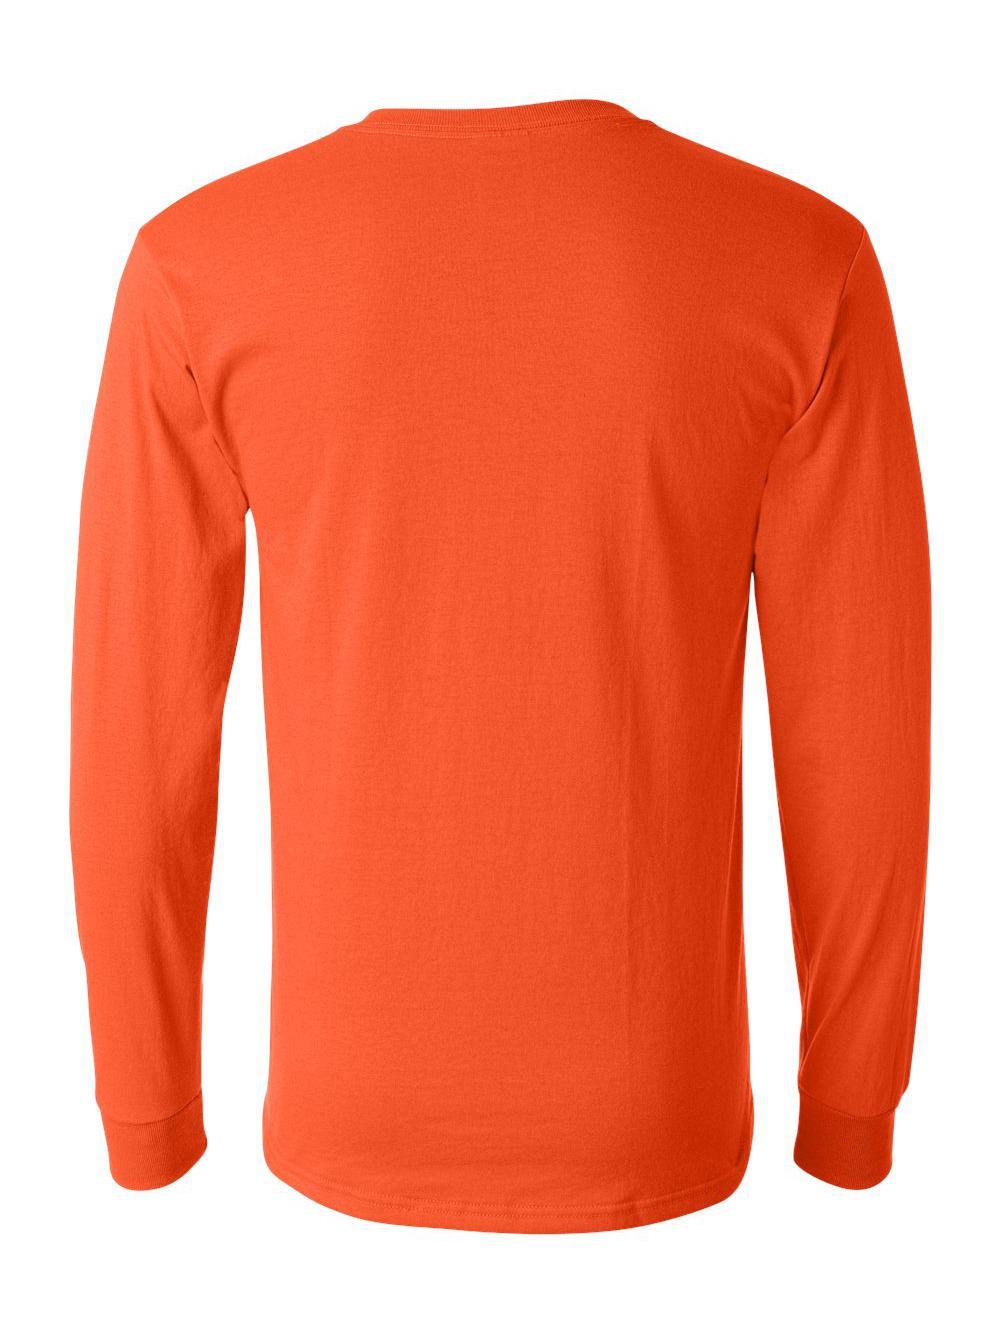 Jerzees-Dri-Power-Long-Sleeve-50-50-T-Shirt-29LSR thumbnail 16